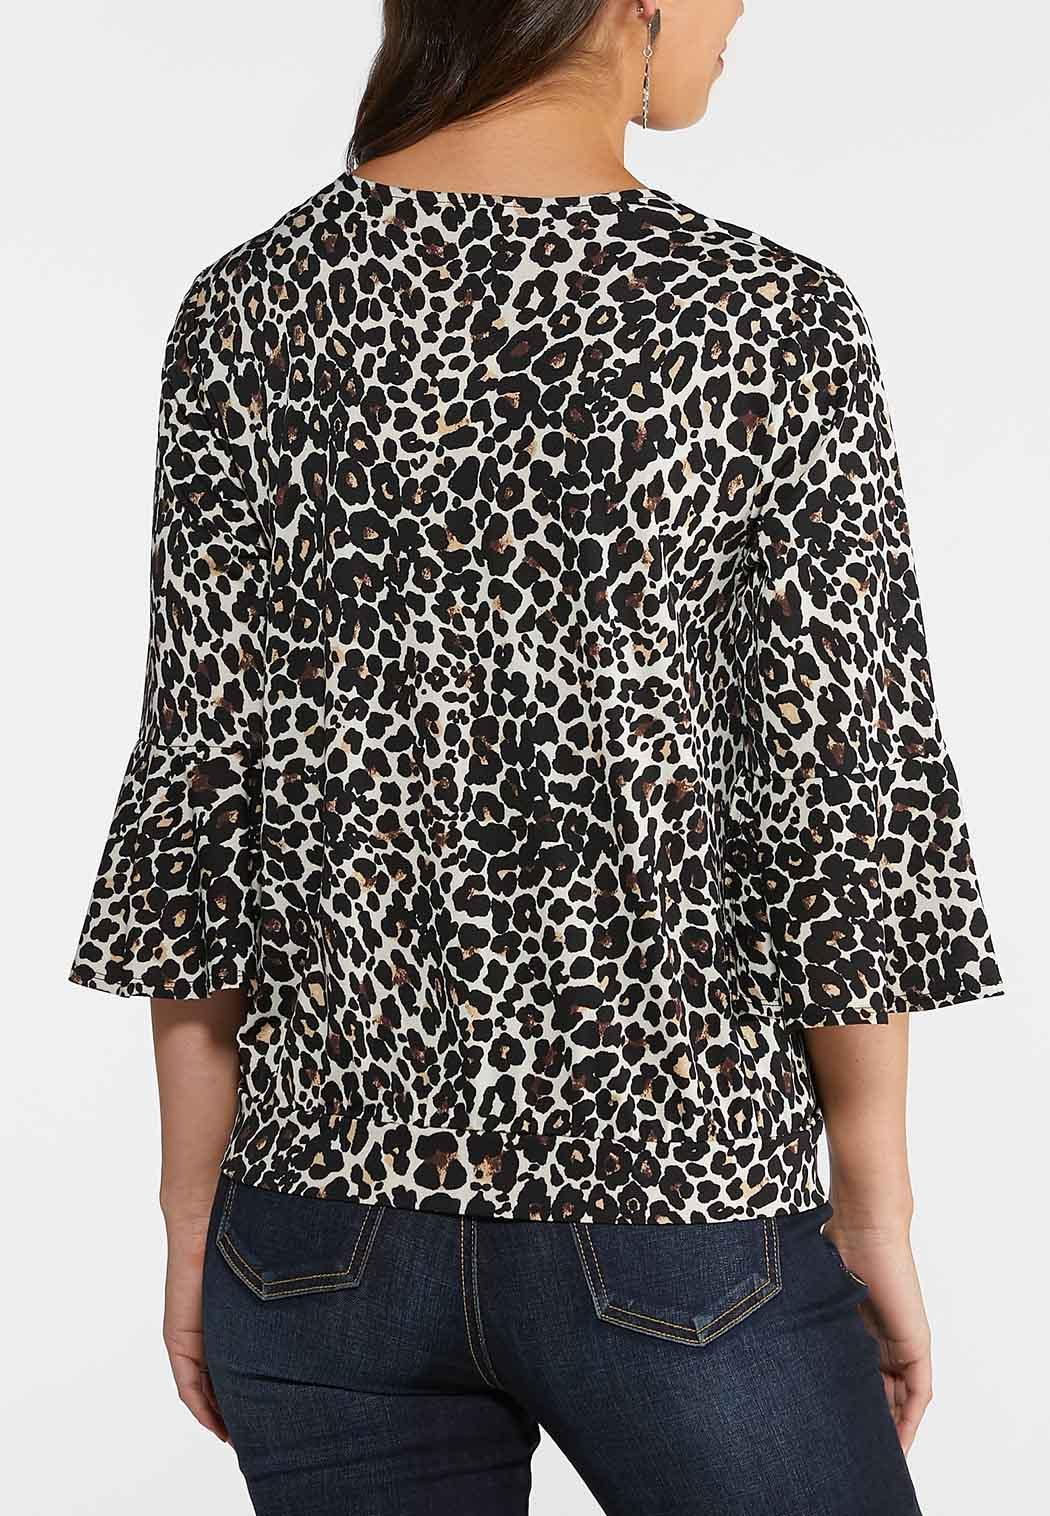 Leopard Flutter Sleeve Top (Item #44014290)